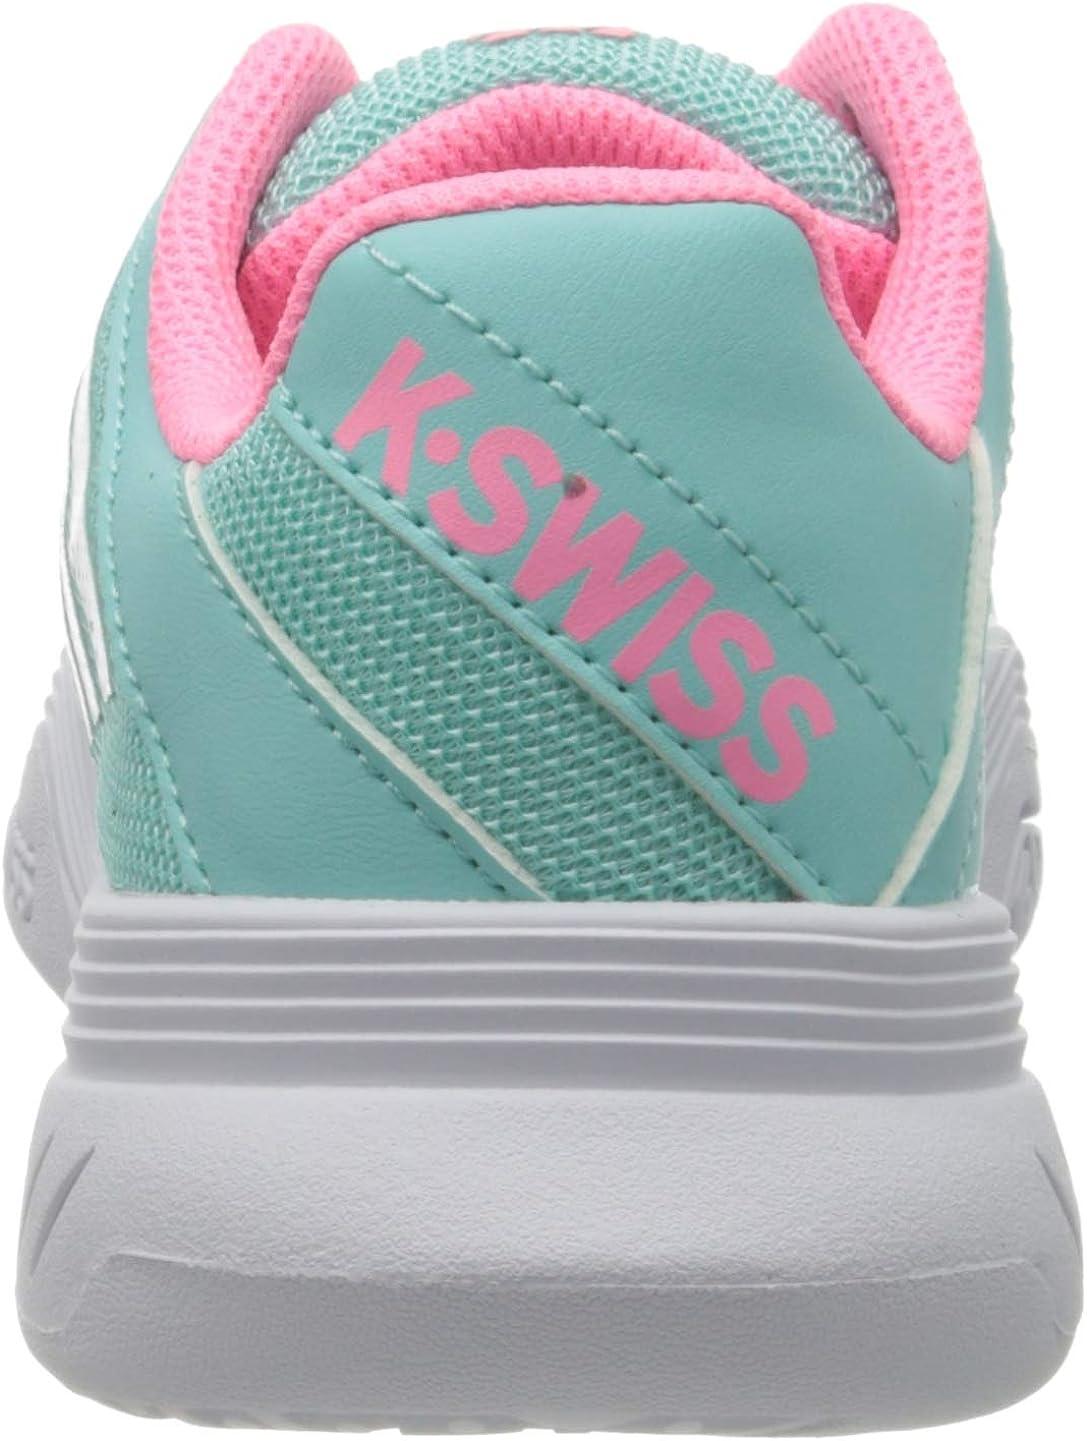 K-Swiss Performance Unisex-Kinder Ks Tfw Court Express Omni-Blue//Pink//White-m Tennisschuhe